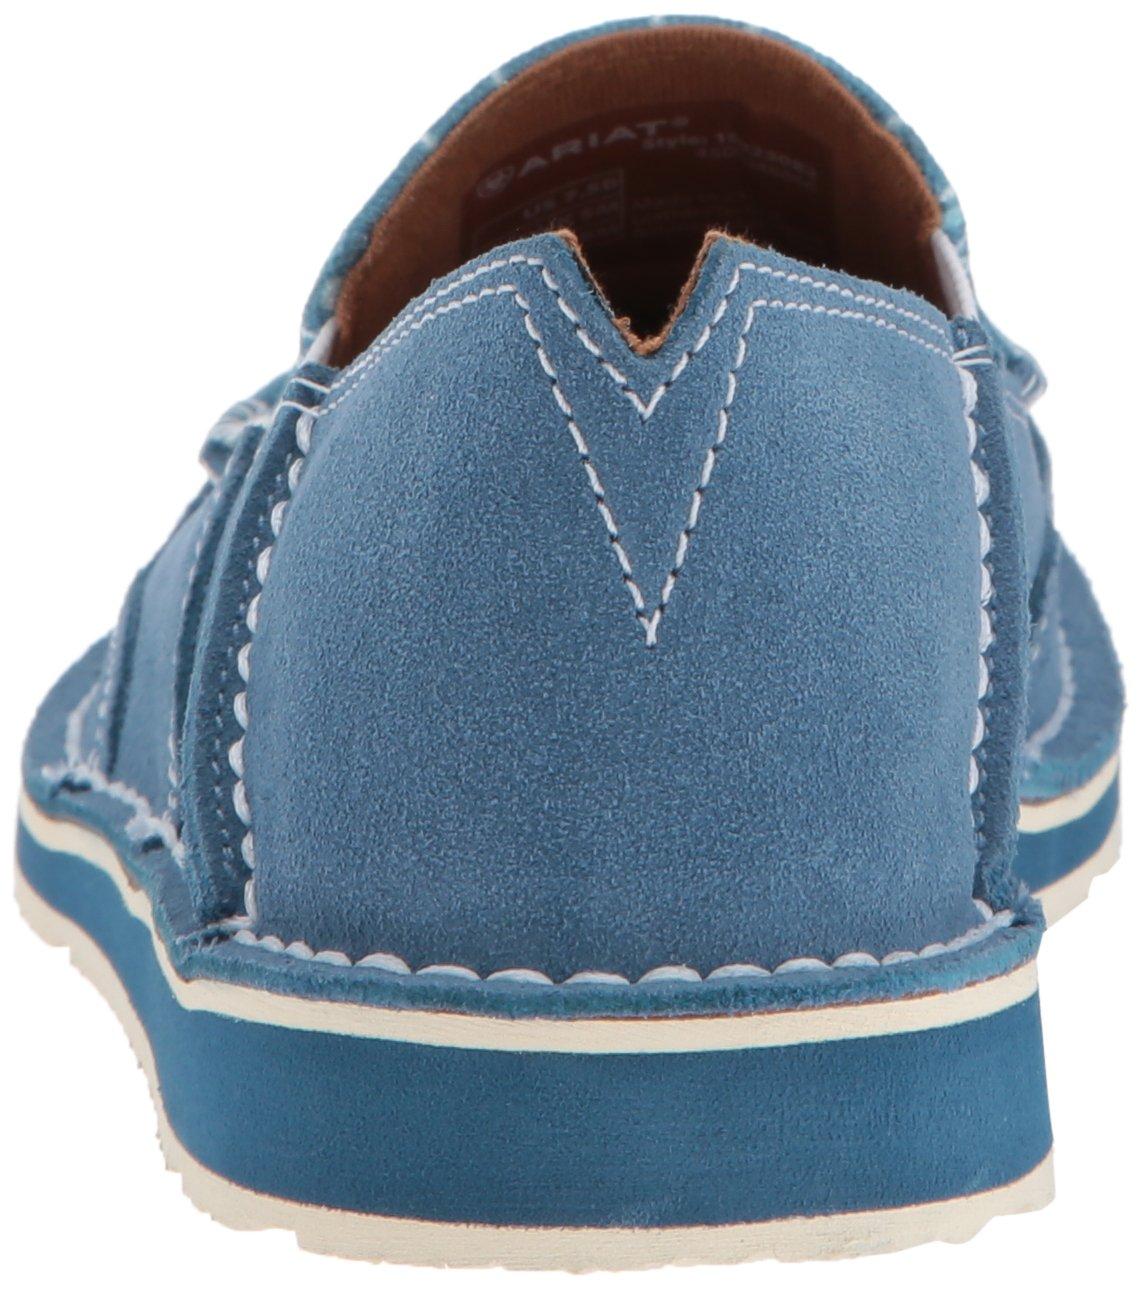 Ariat Women's English Cruiser Sneaker B076MFK6C9 10 B(M) US|Teal Snaffle British